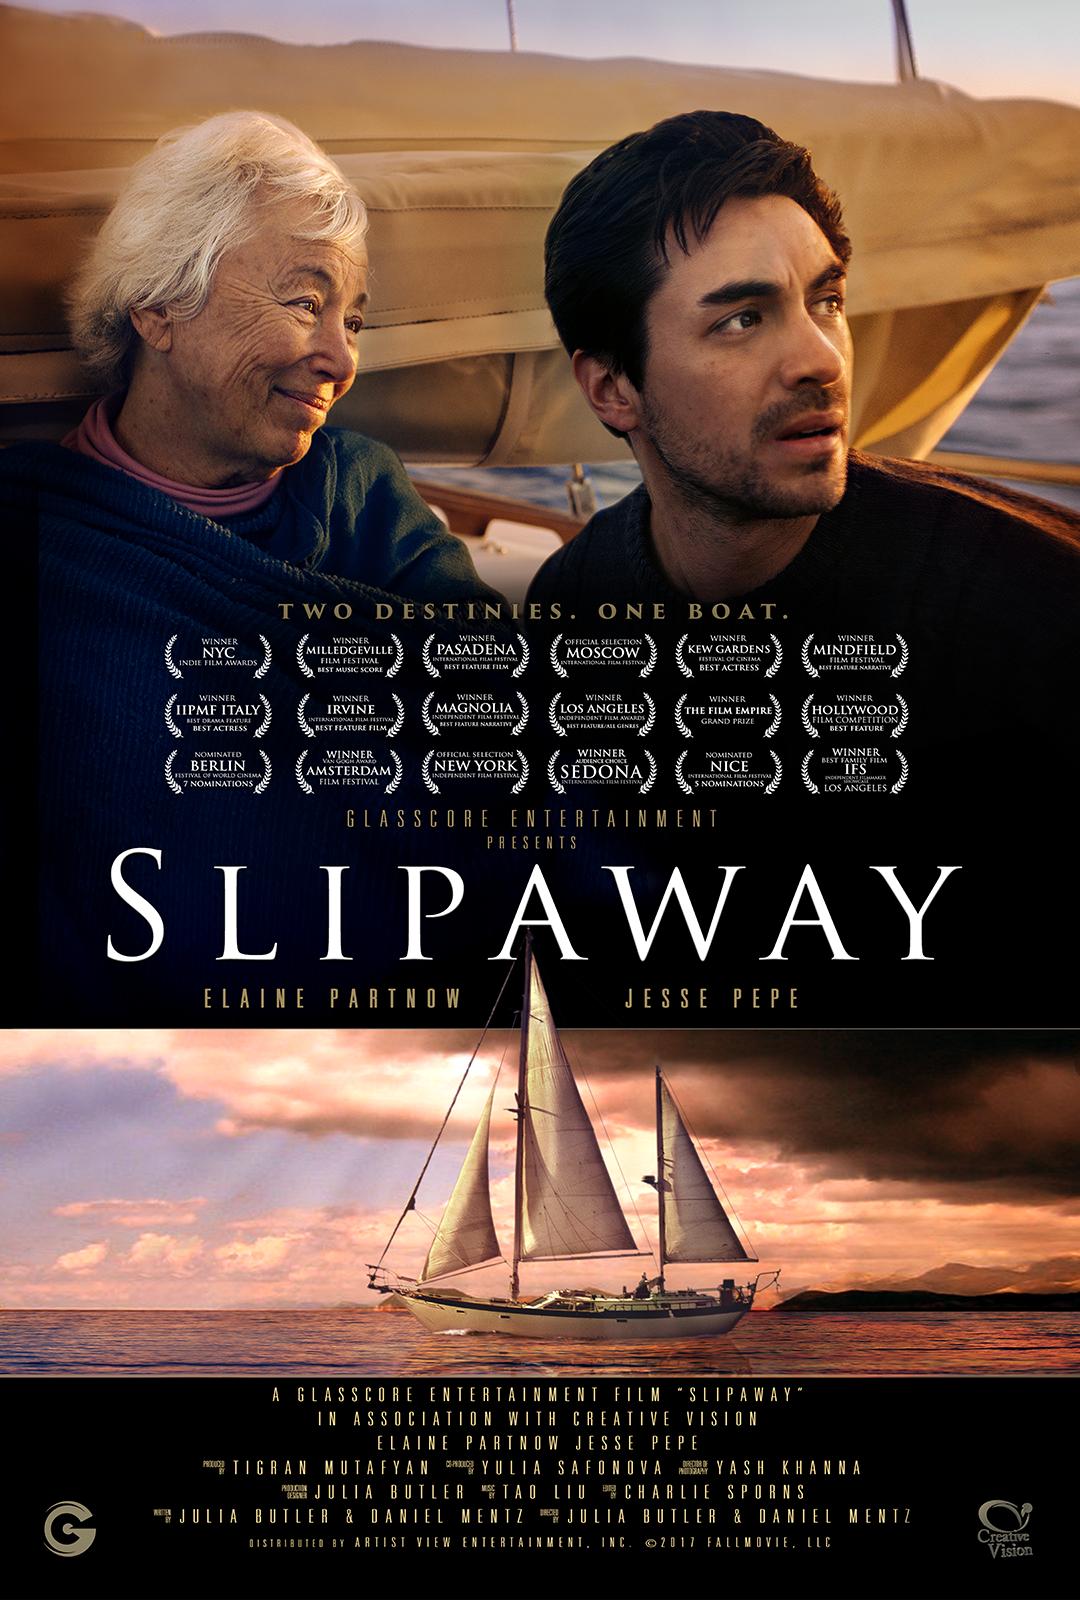 Slipaway Poster 27x40 with 18 laurels (no banner) 1080.png